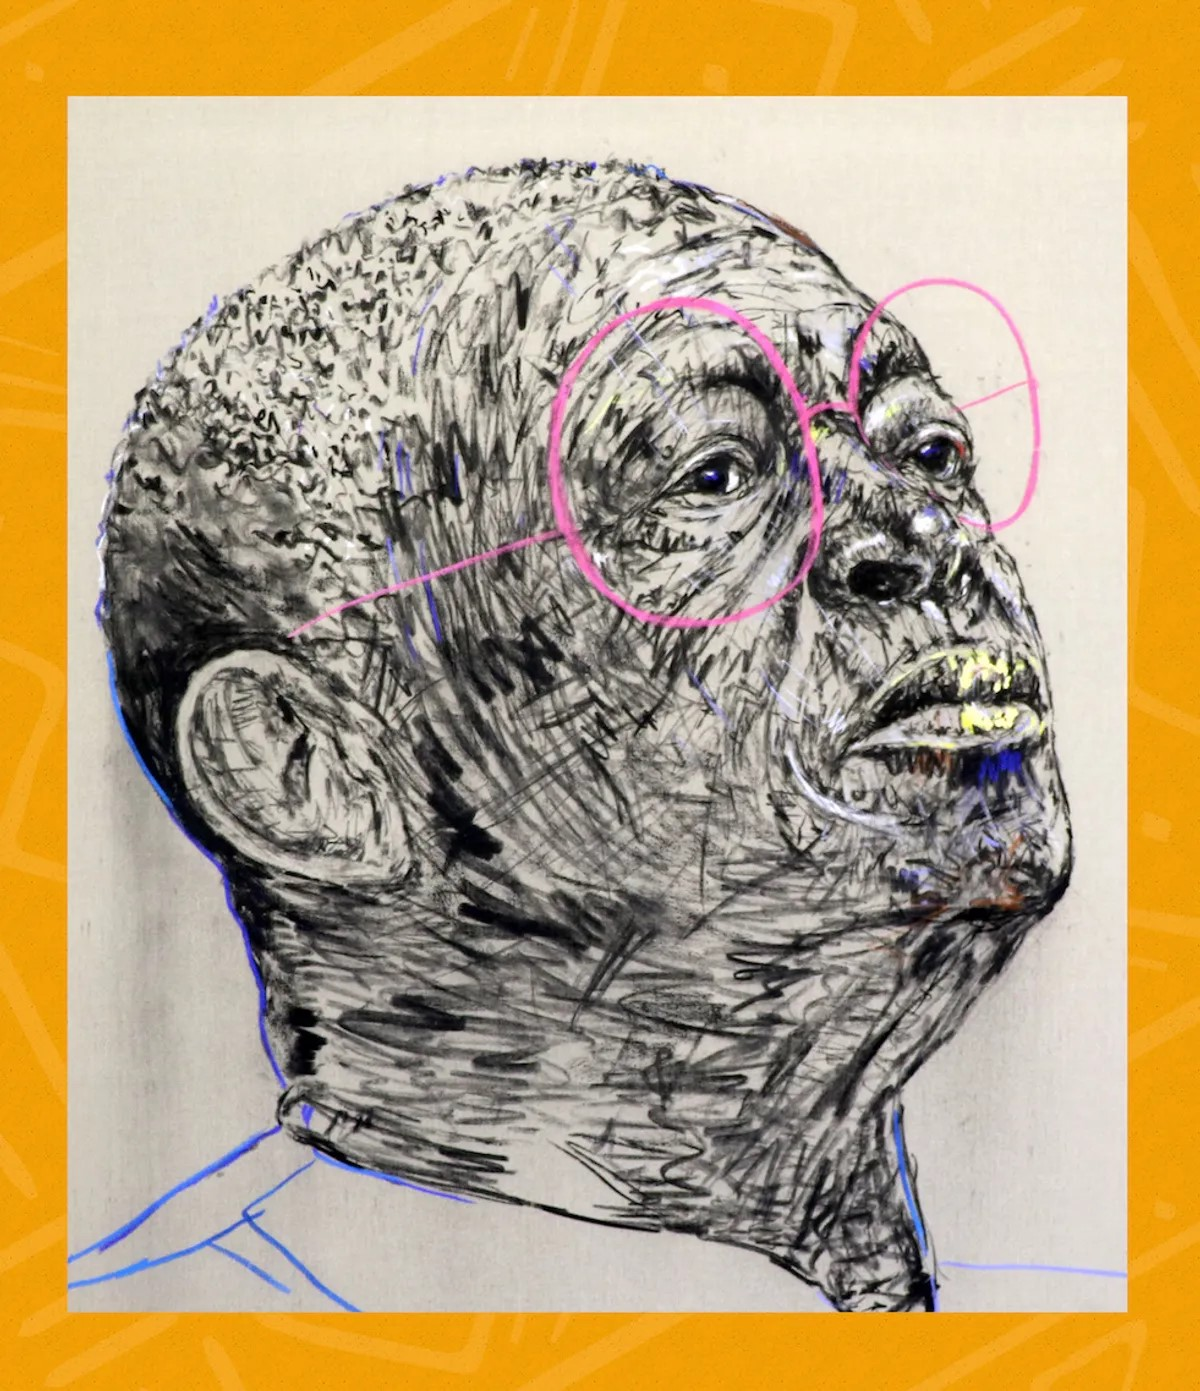 Hugh Masekela - Township Grooves